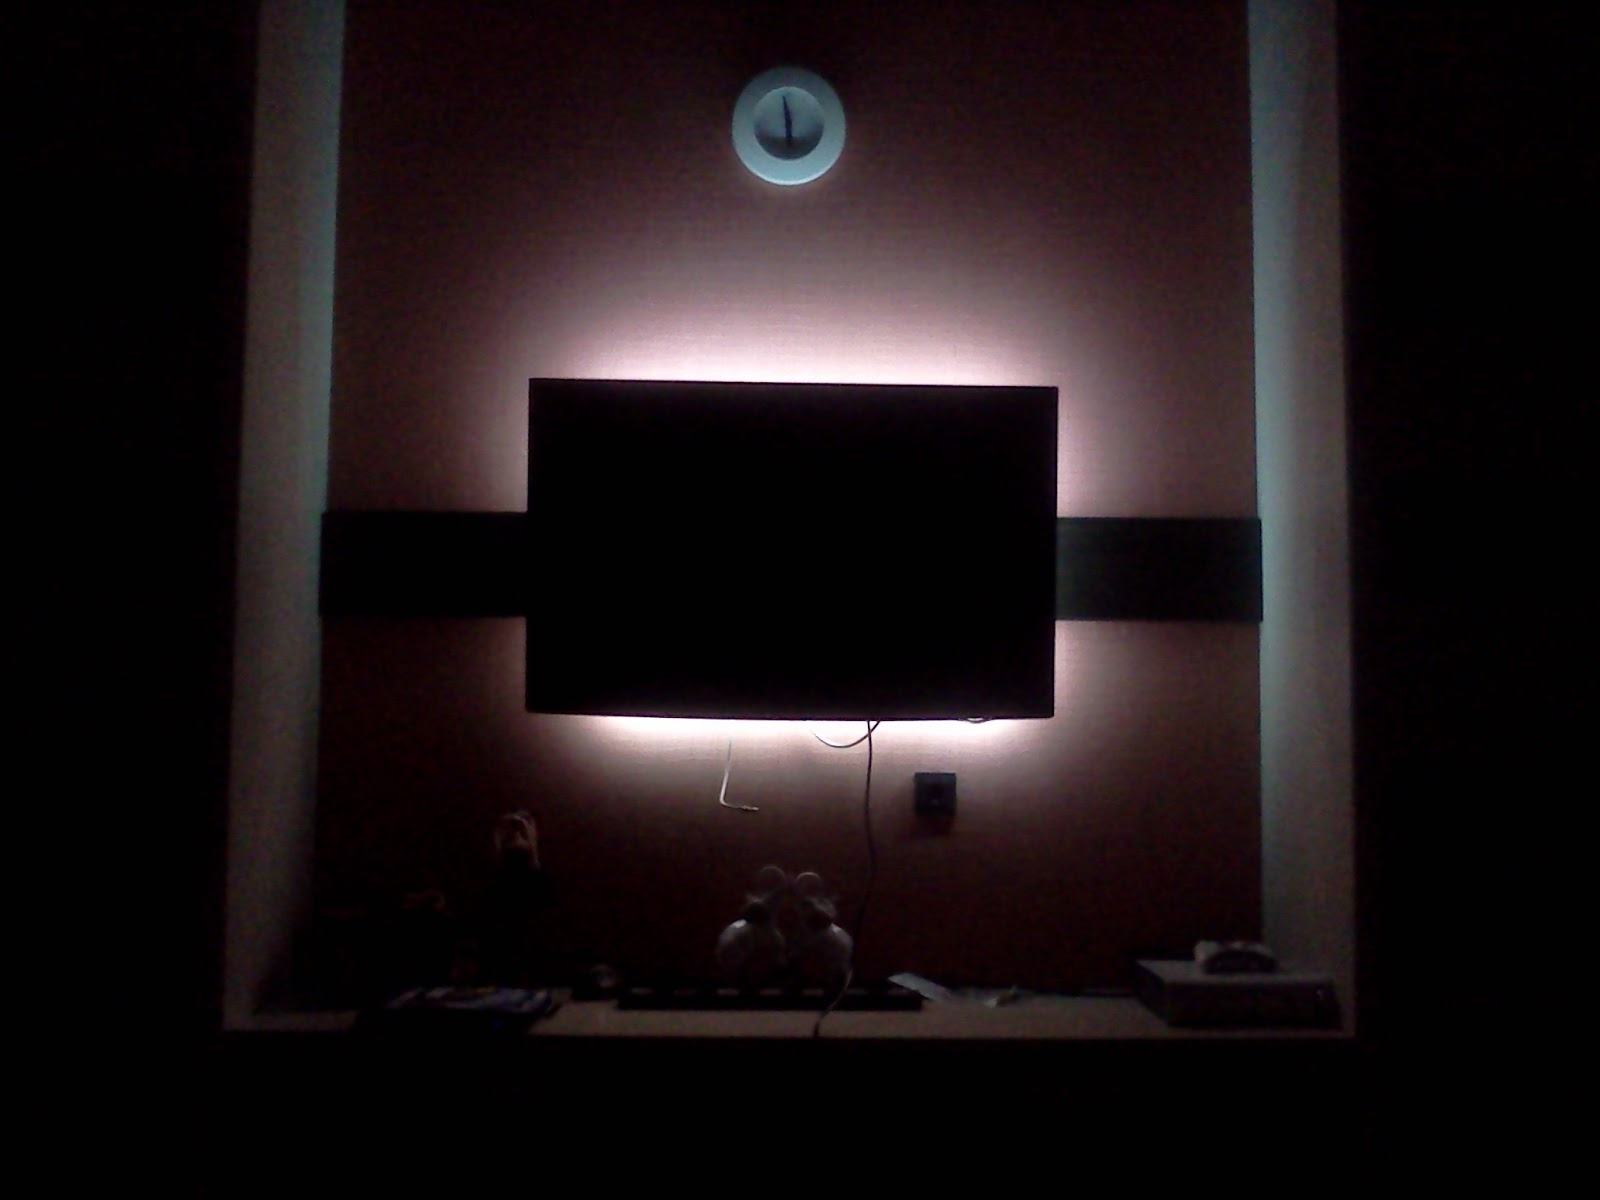 Подсветка для телевизора своими руками